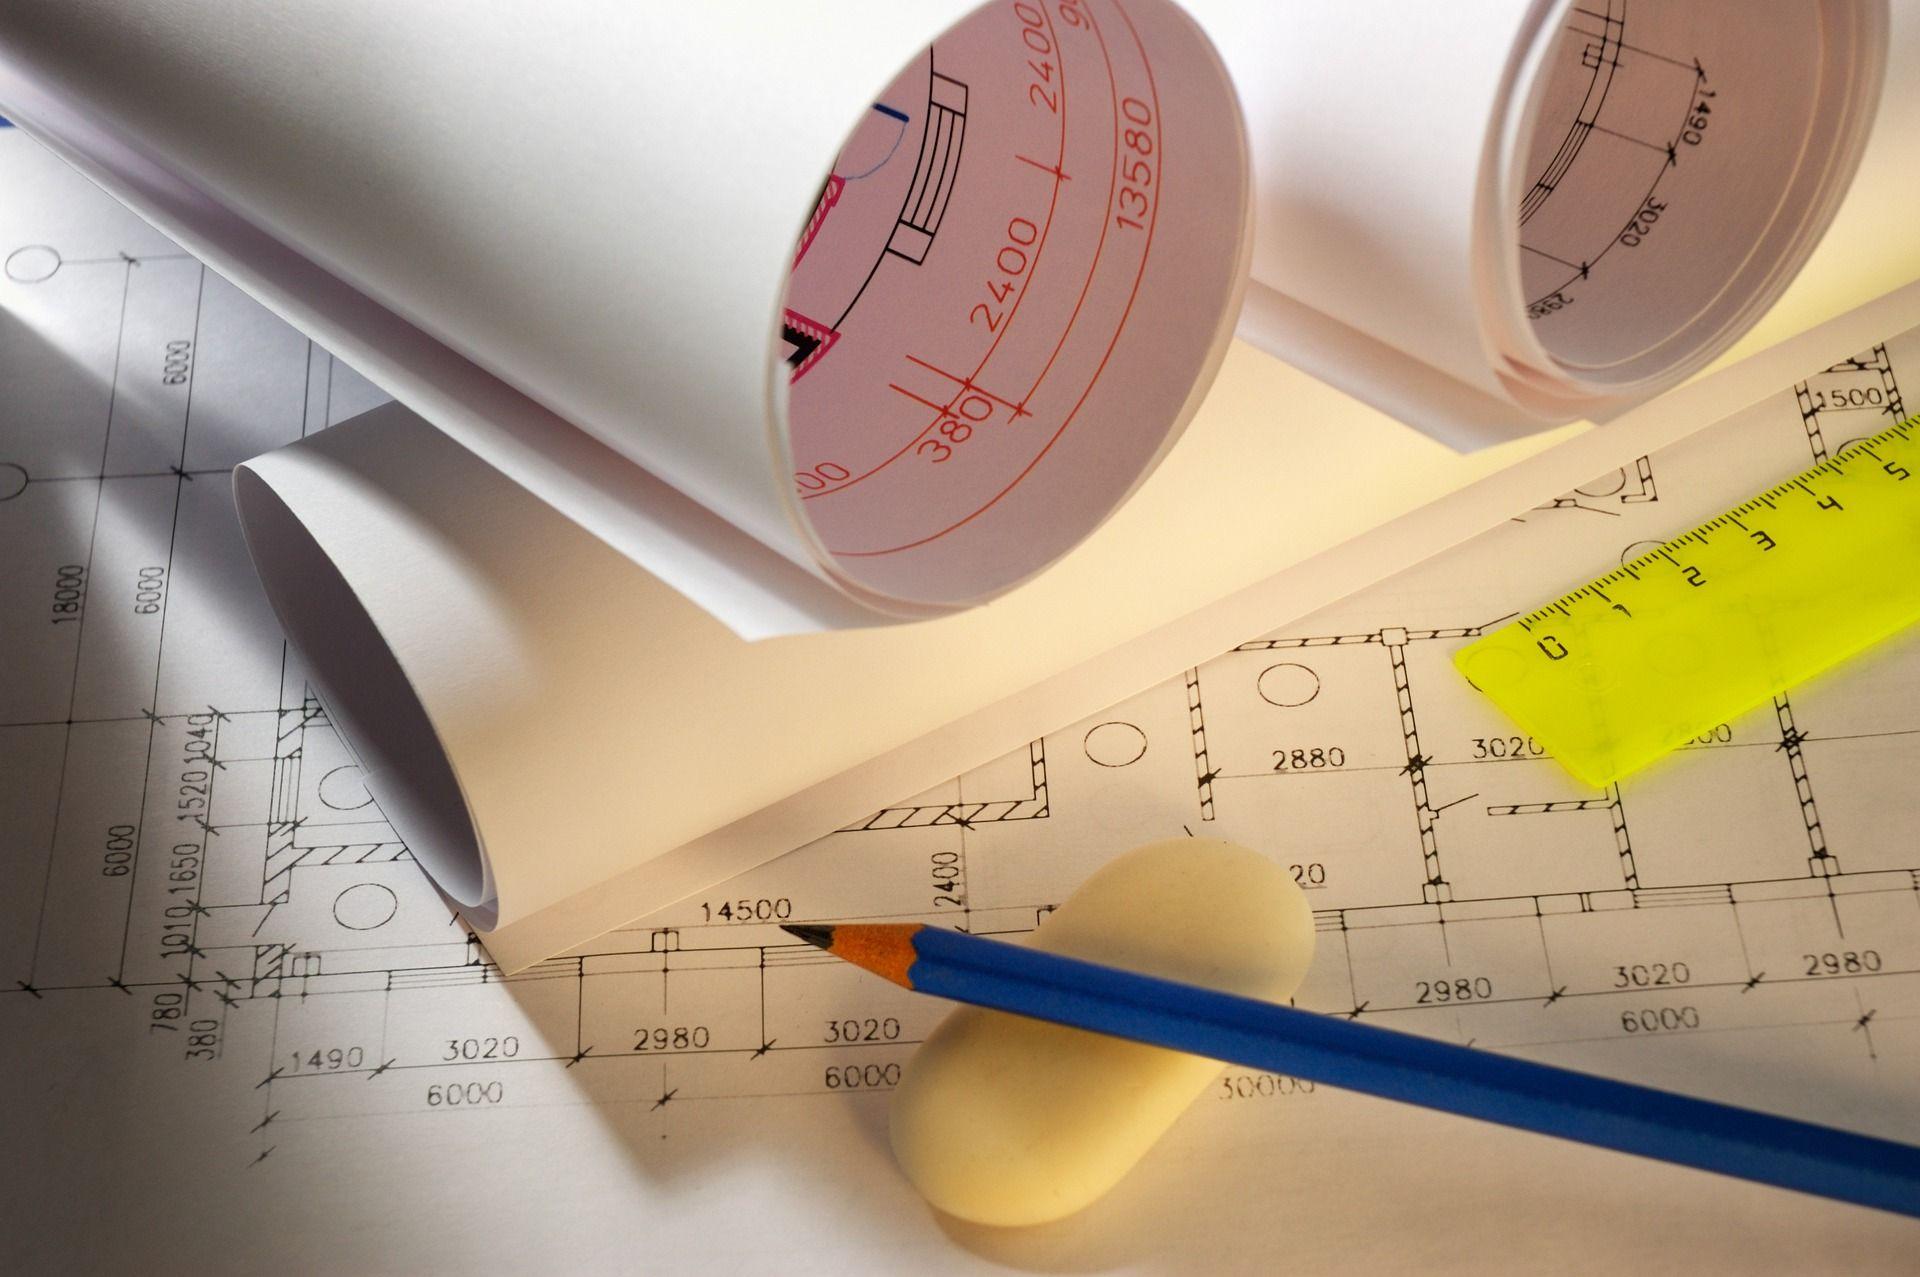 Contractor License